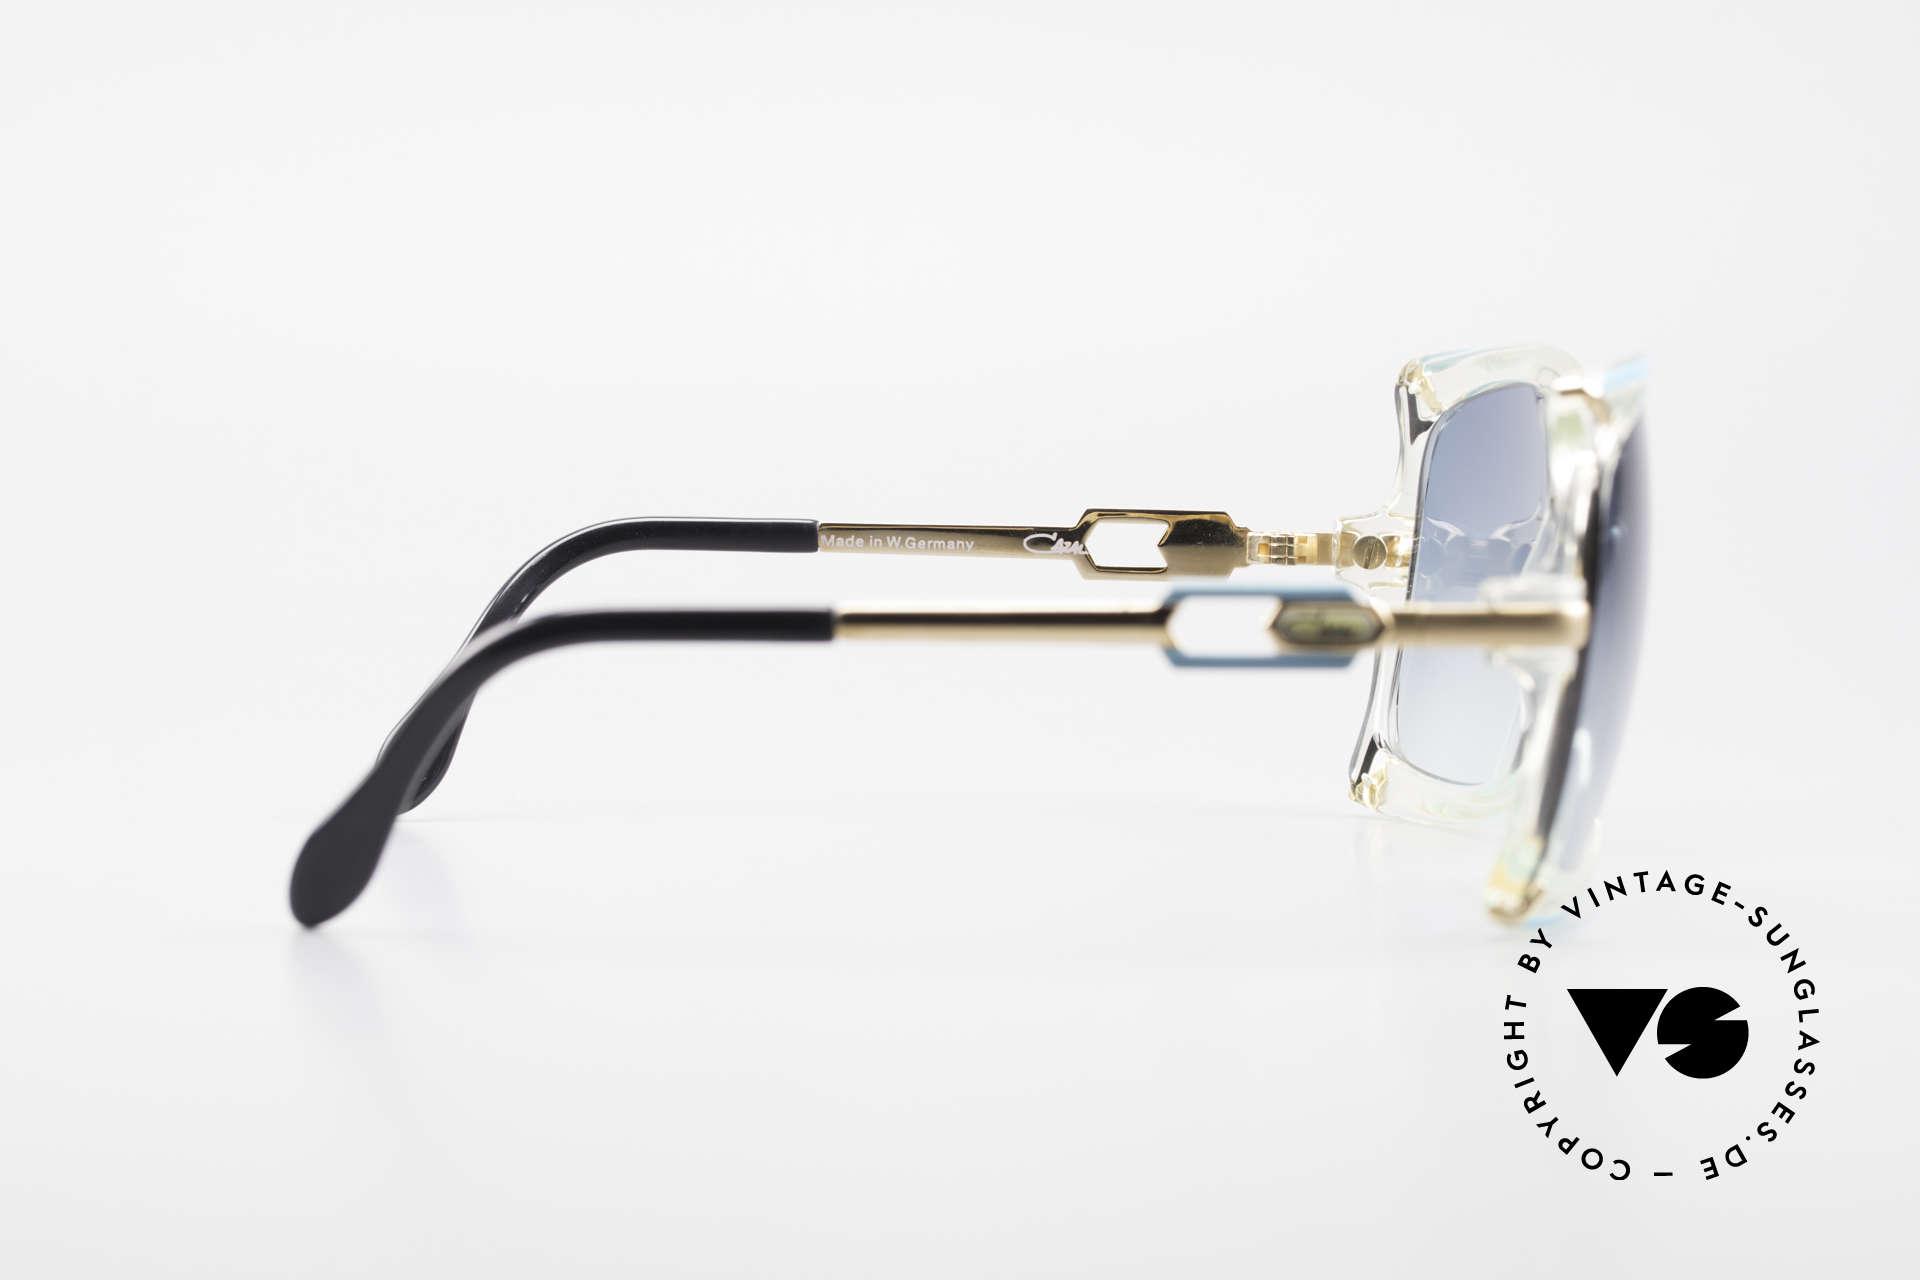 Cazal 864 Rare 80's Cazal XL Sunglasses, NO RETRO sunglasses, but a 35 years old rarity!, Made for Women